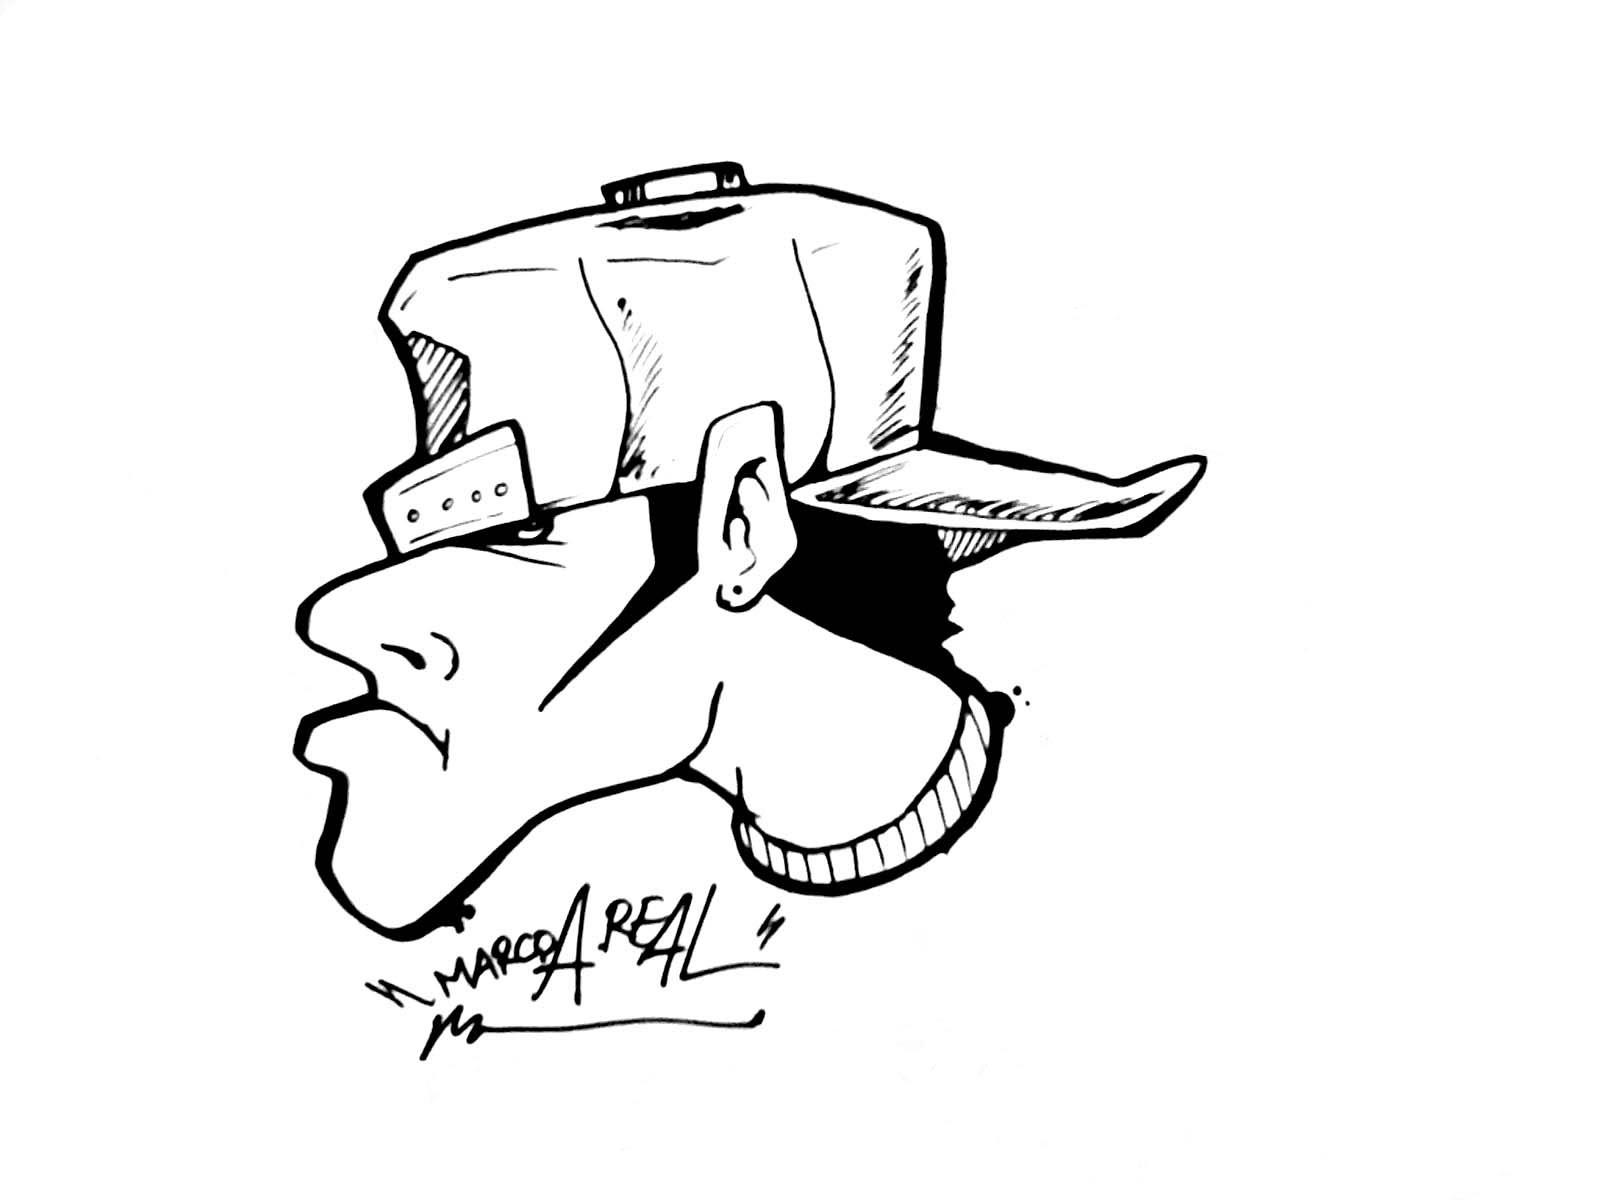 1600x1200 Graffiti Cartoon Drawings Of Skulls Step By Step